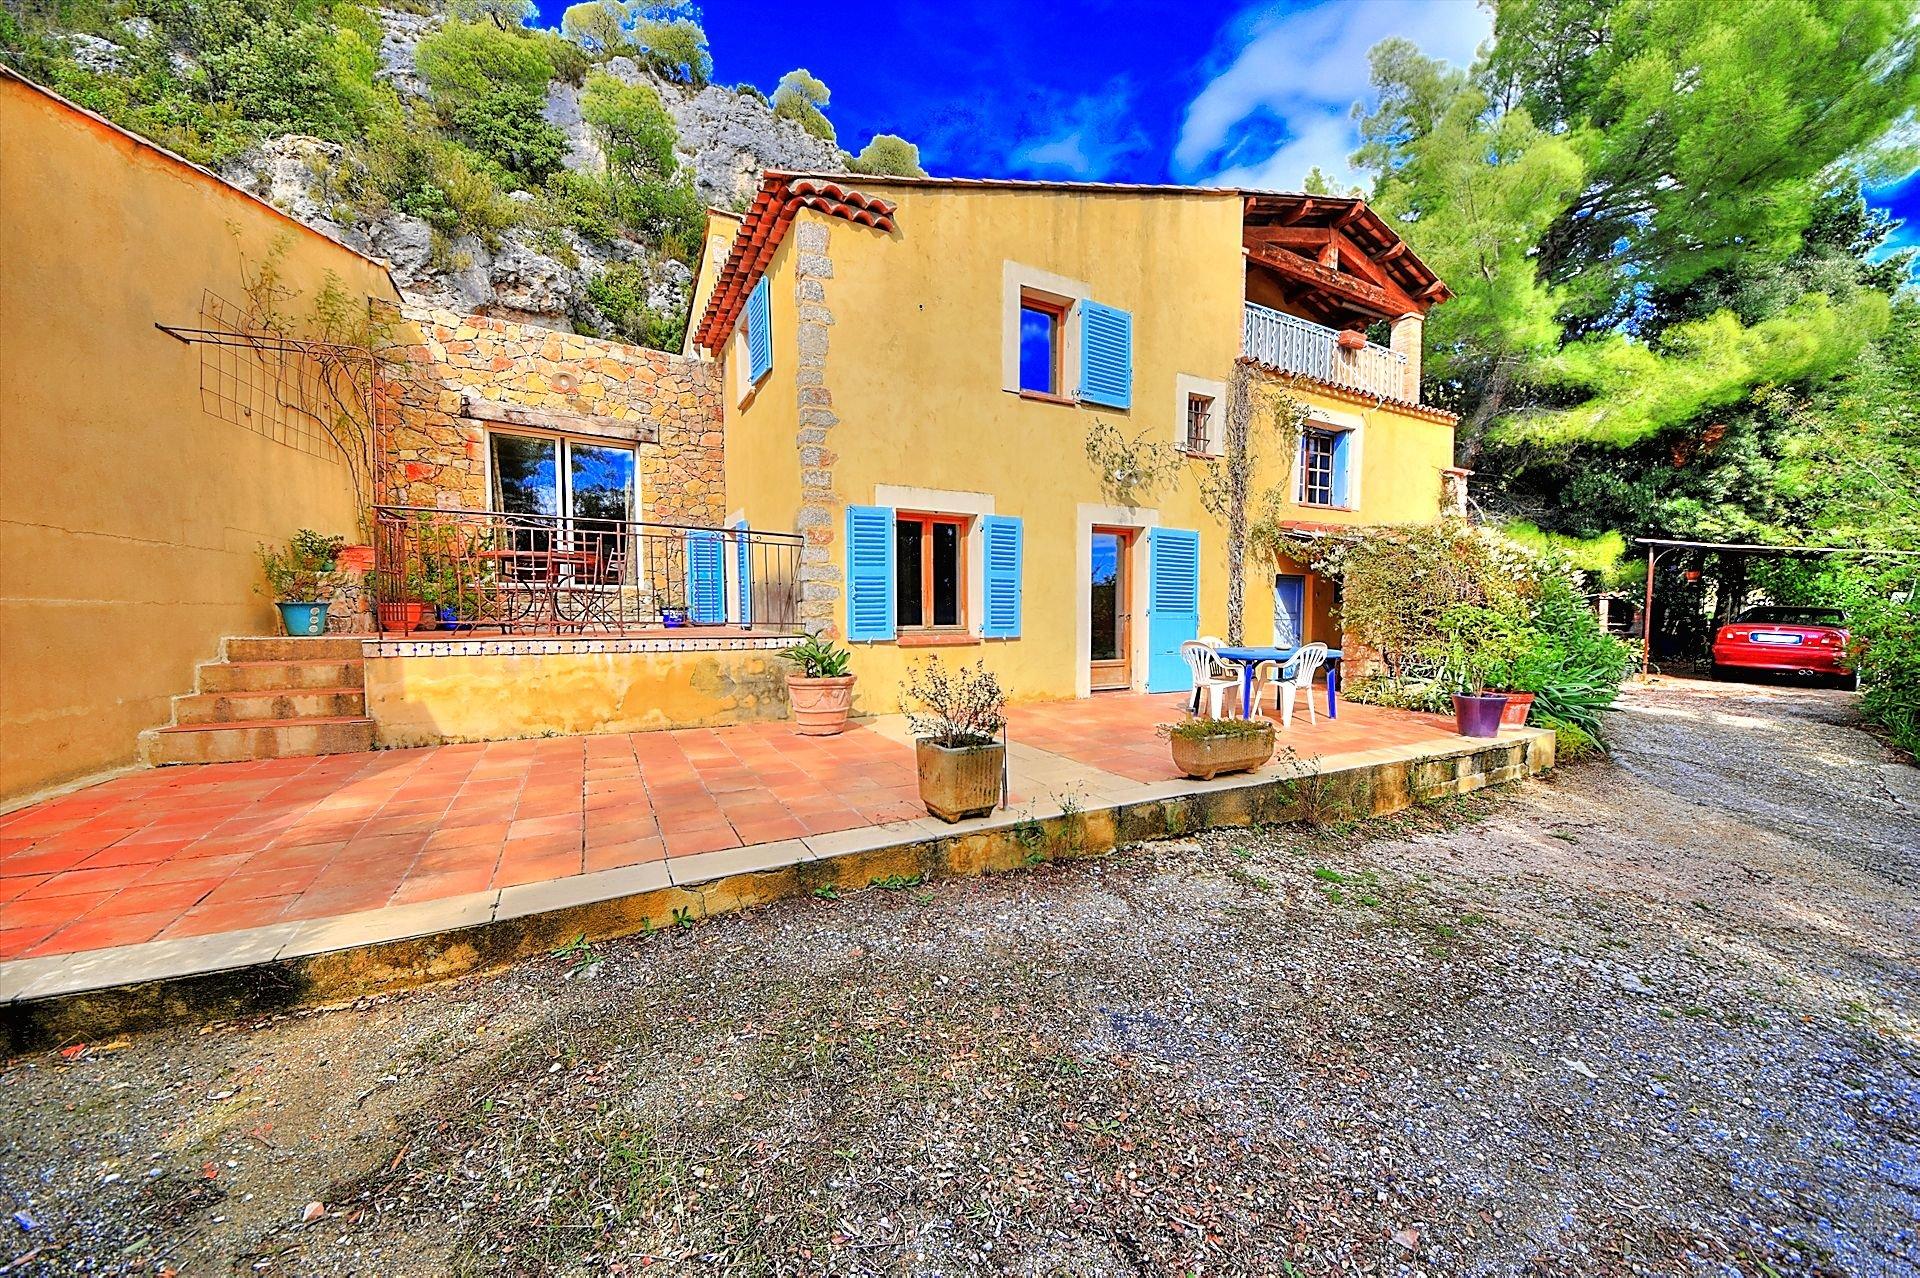 Nice Provencal house, Villecroze, Var Provence